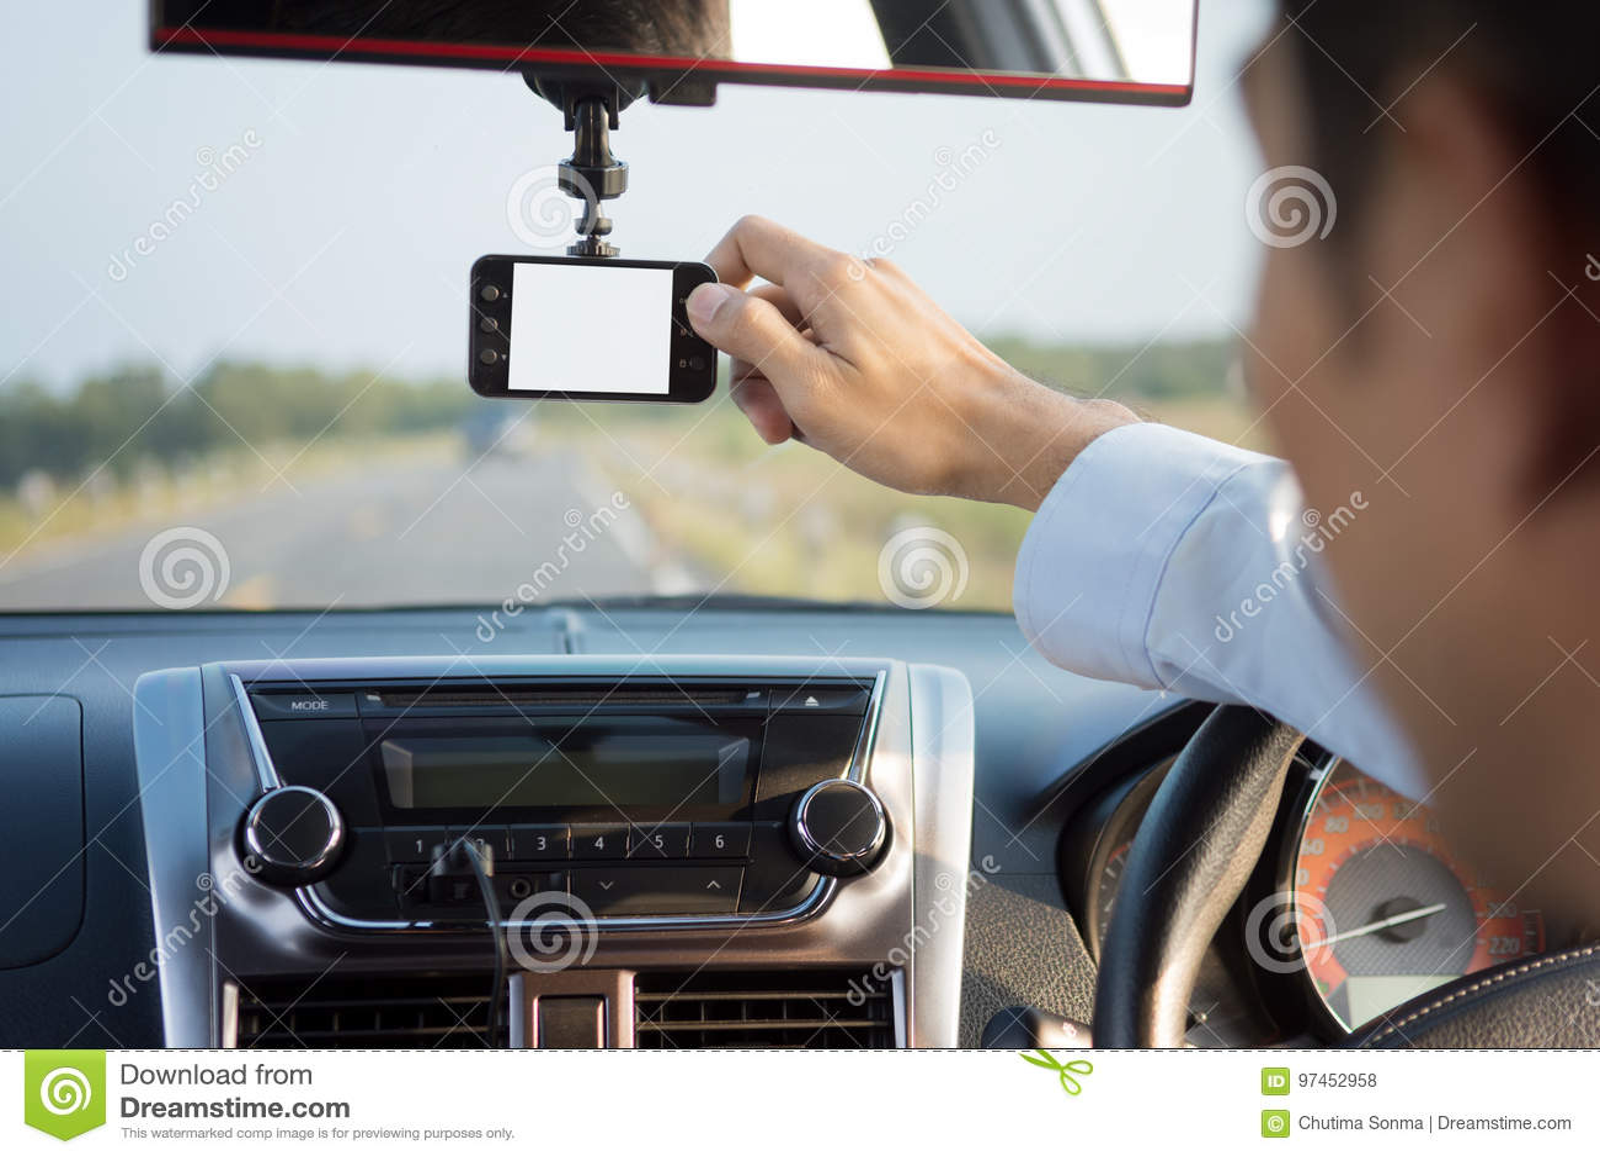 Magnétoscope conduisant une voiture